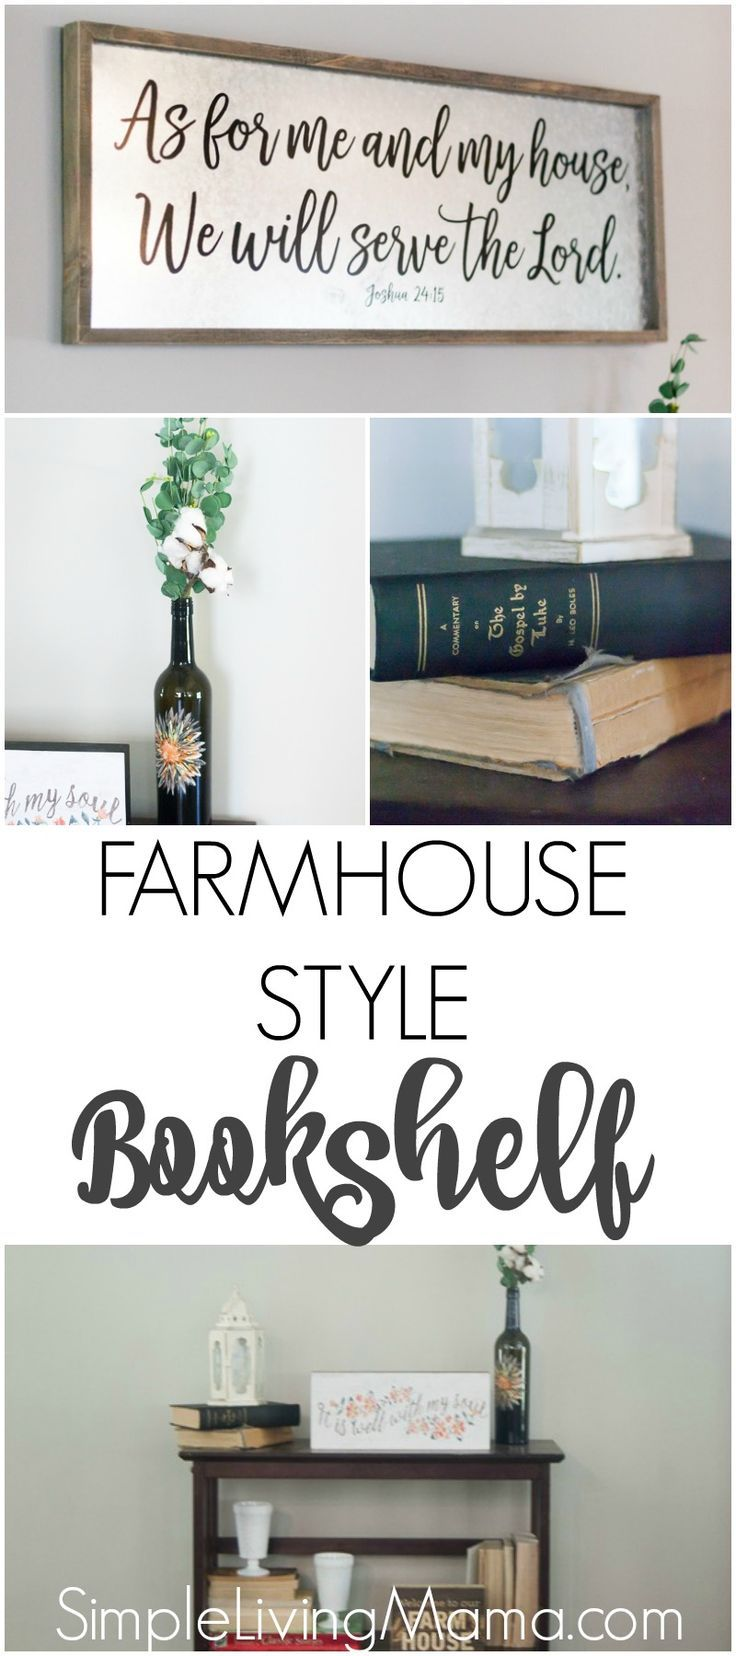 best Farmhouse Style images on Pinterest Basement living rooms